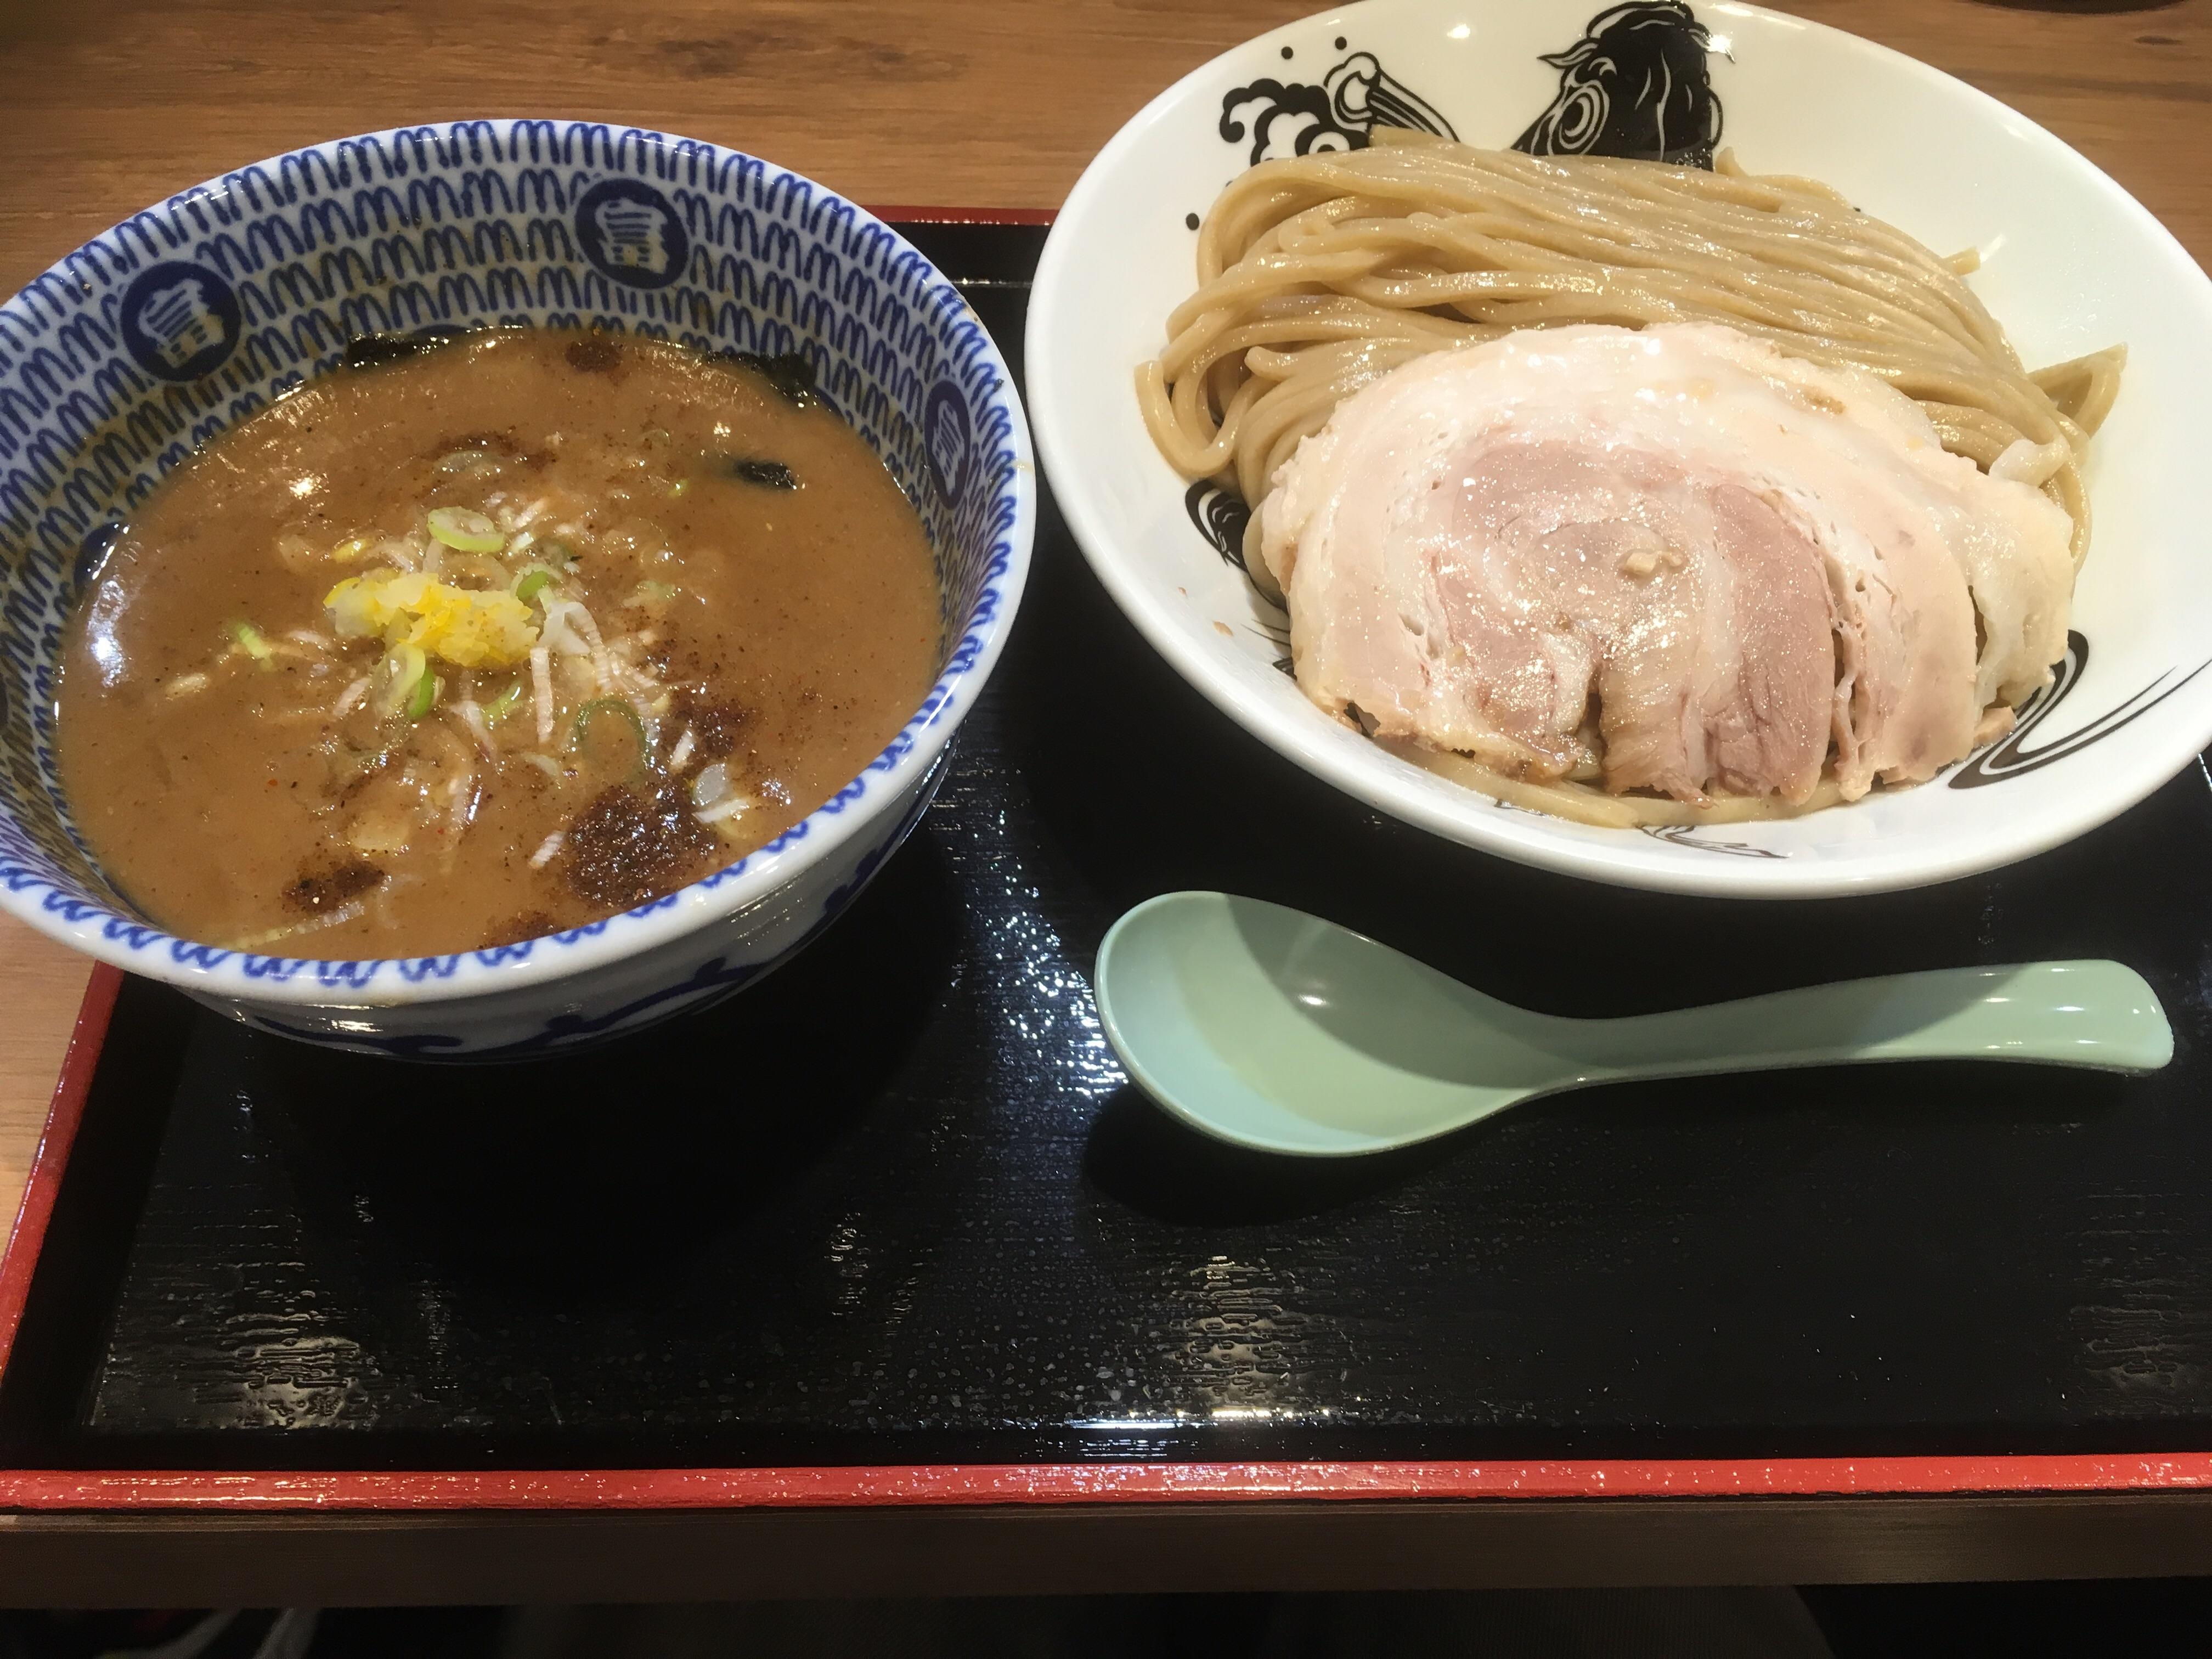 f:id:yudaizu:20161117163410j:image